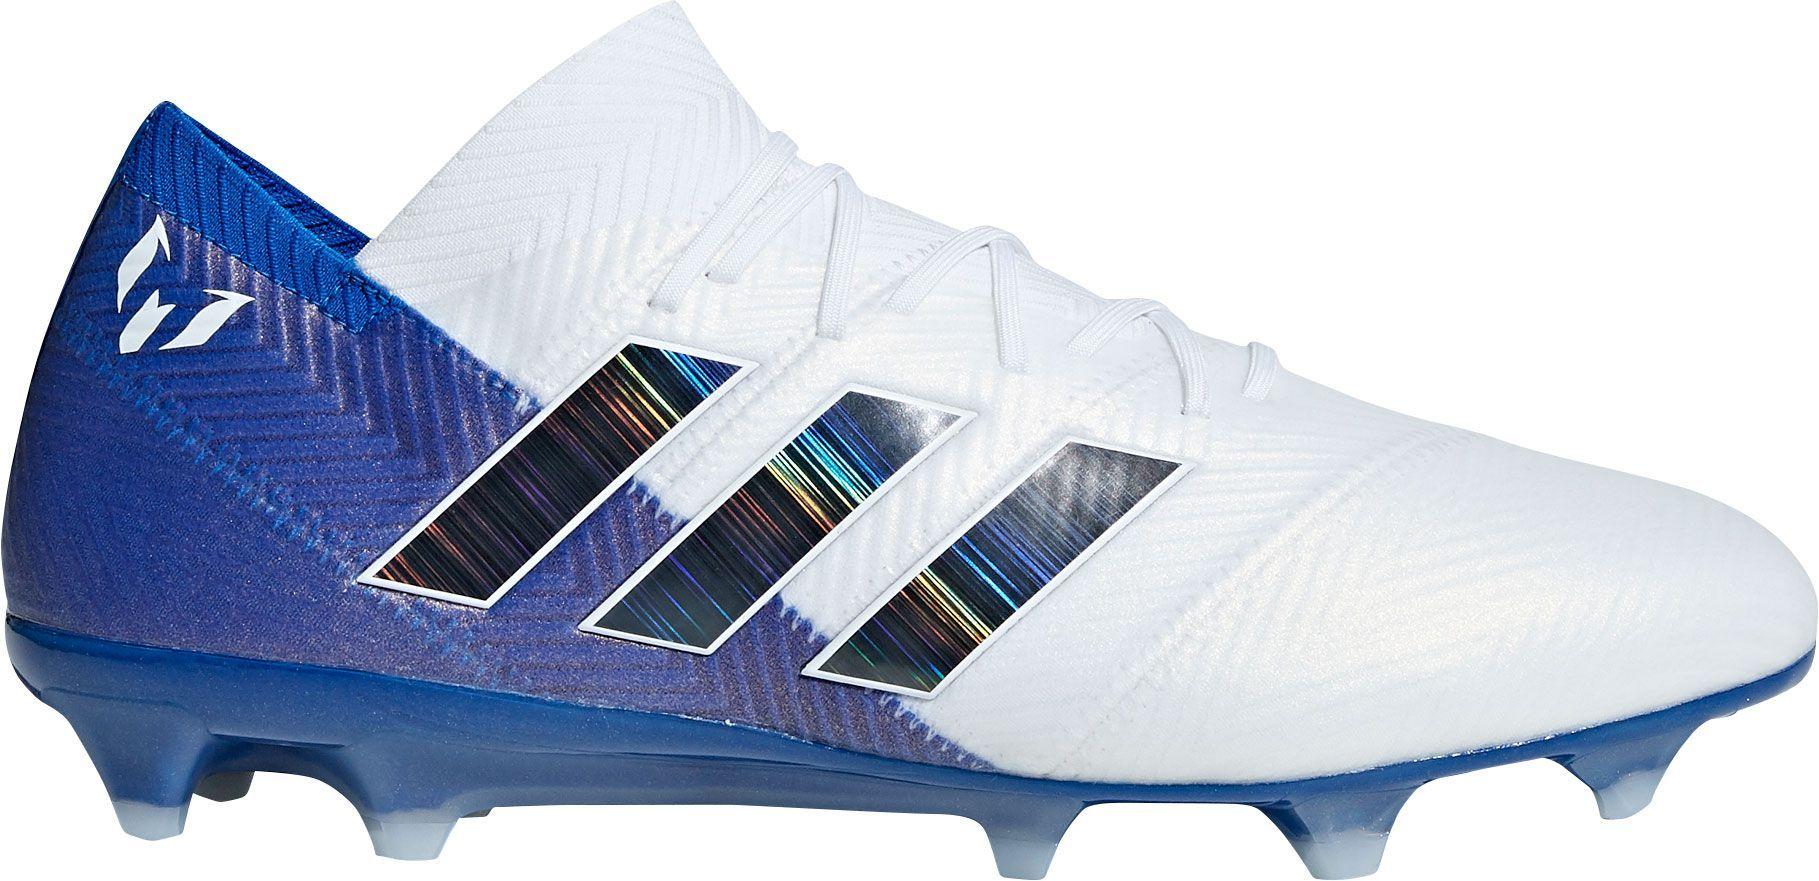 best sneakers 2906f 73e70 adidas Men s Nemeziz Messi 18.1 FG Soccer Cleats, White